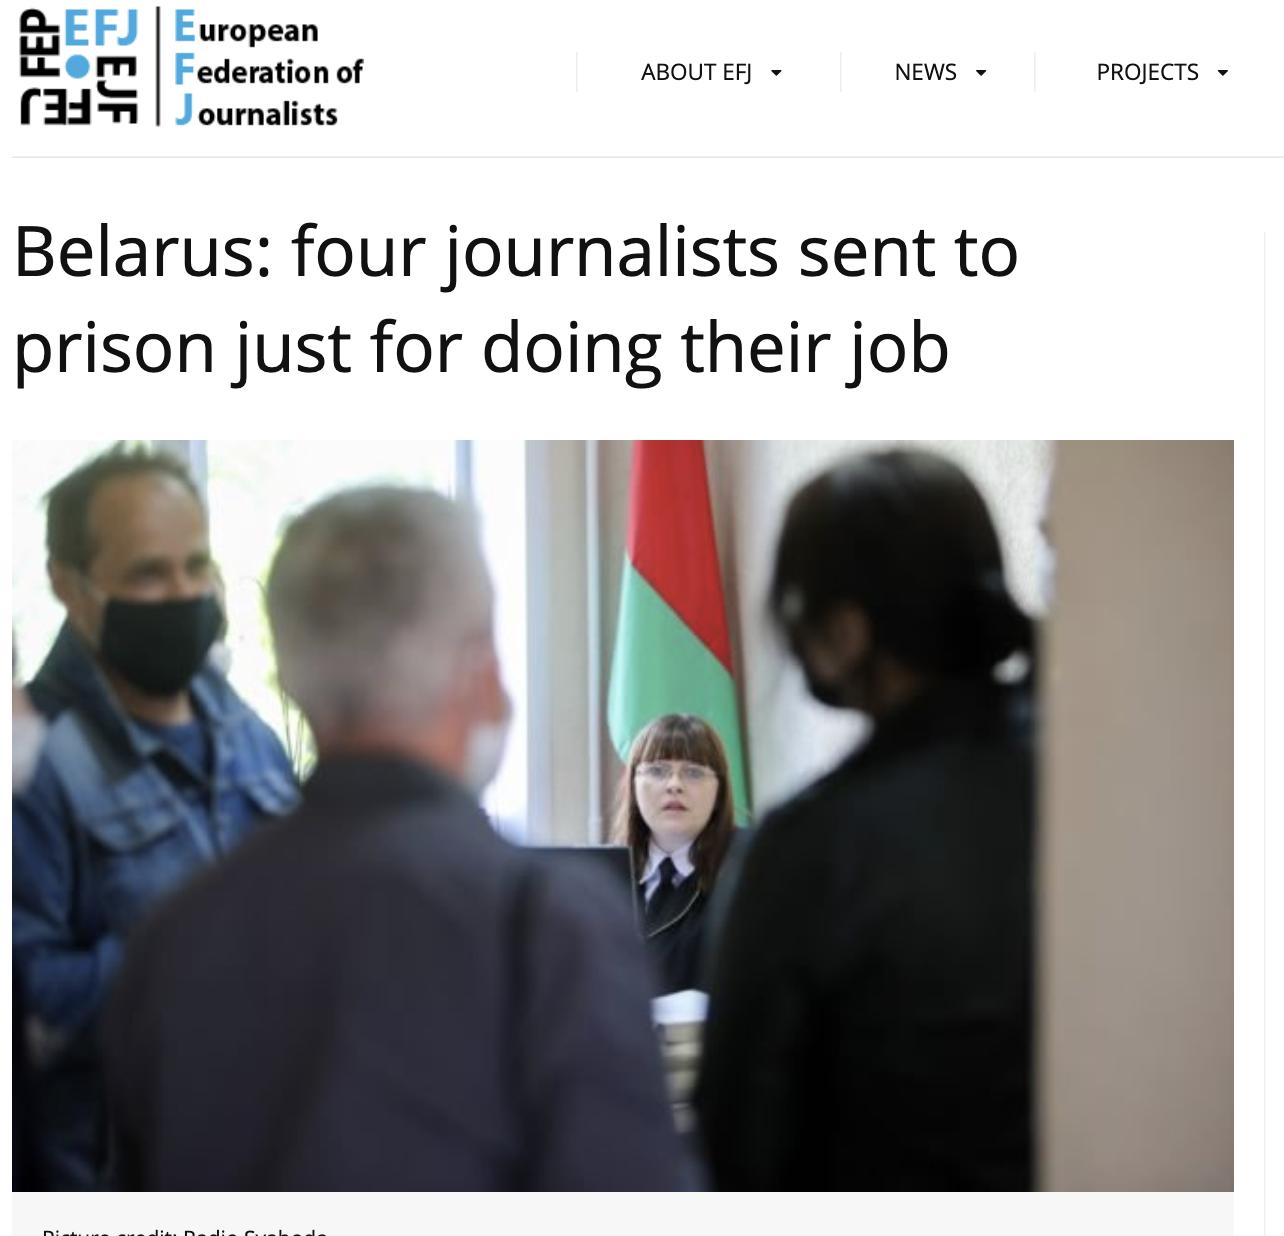 Skjermdump av EFJ-nettside. foto: Radio Svaboda